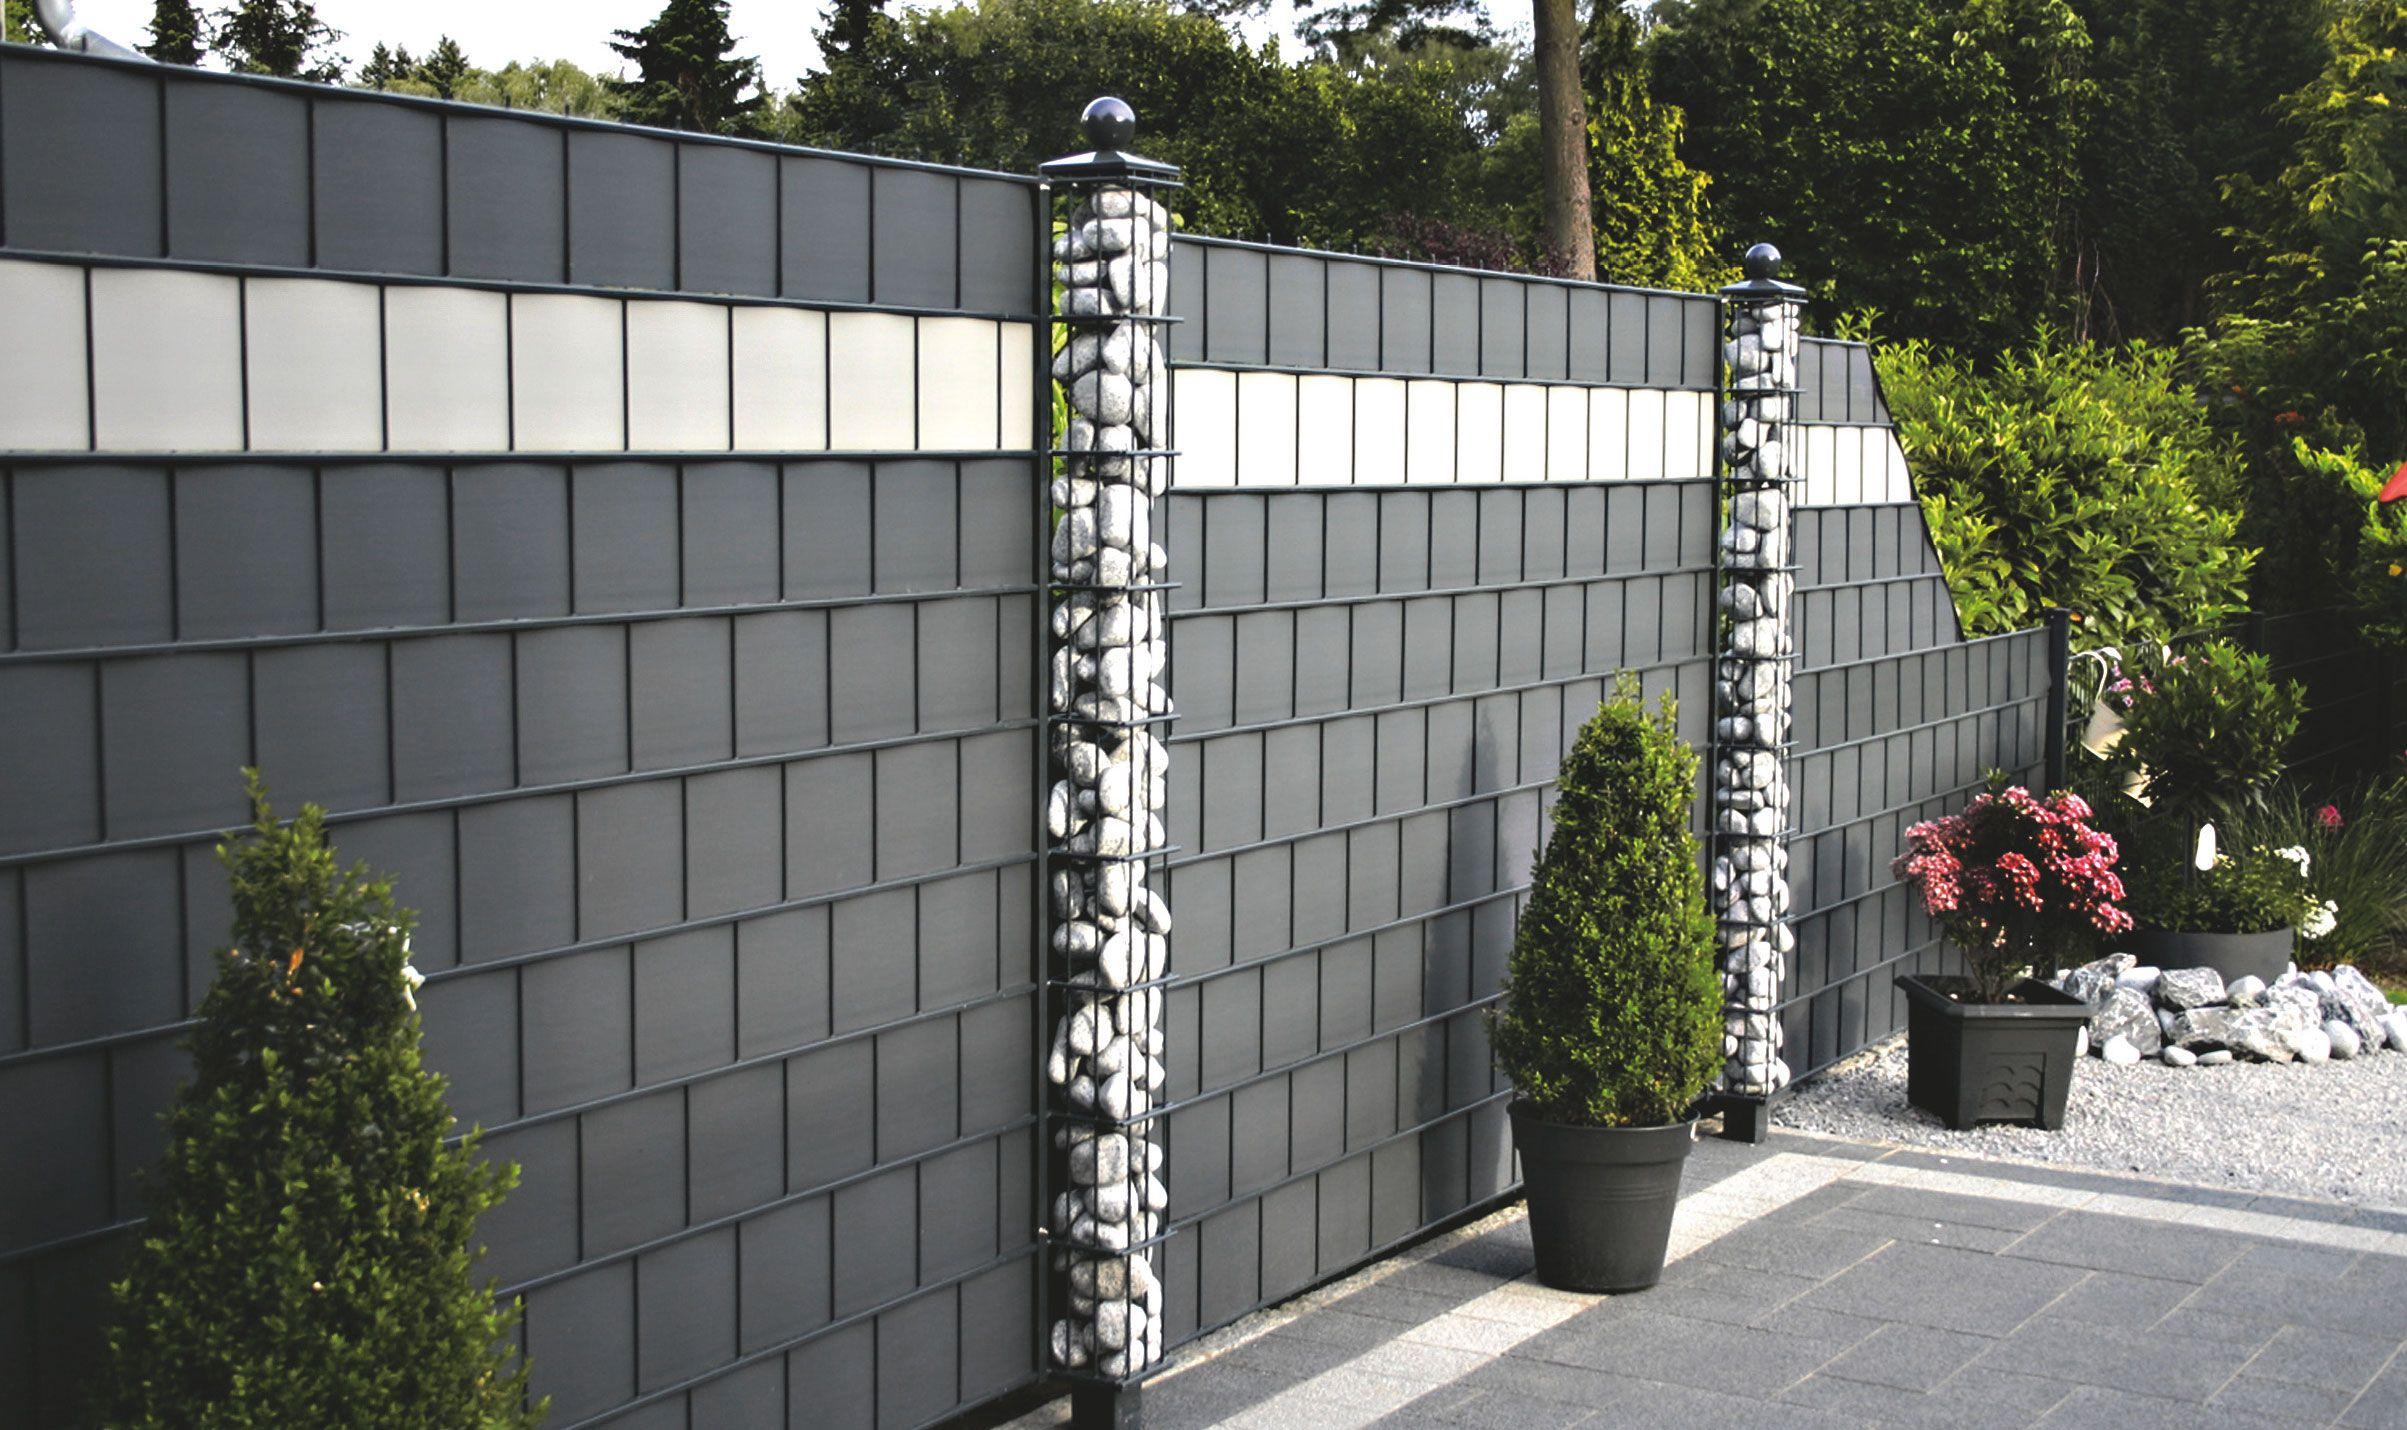 Zaun & Sichtschutz selber bauen Sichtschutzzaun garten